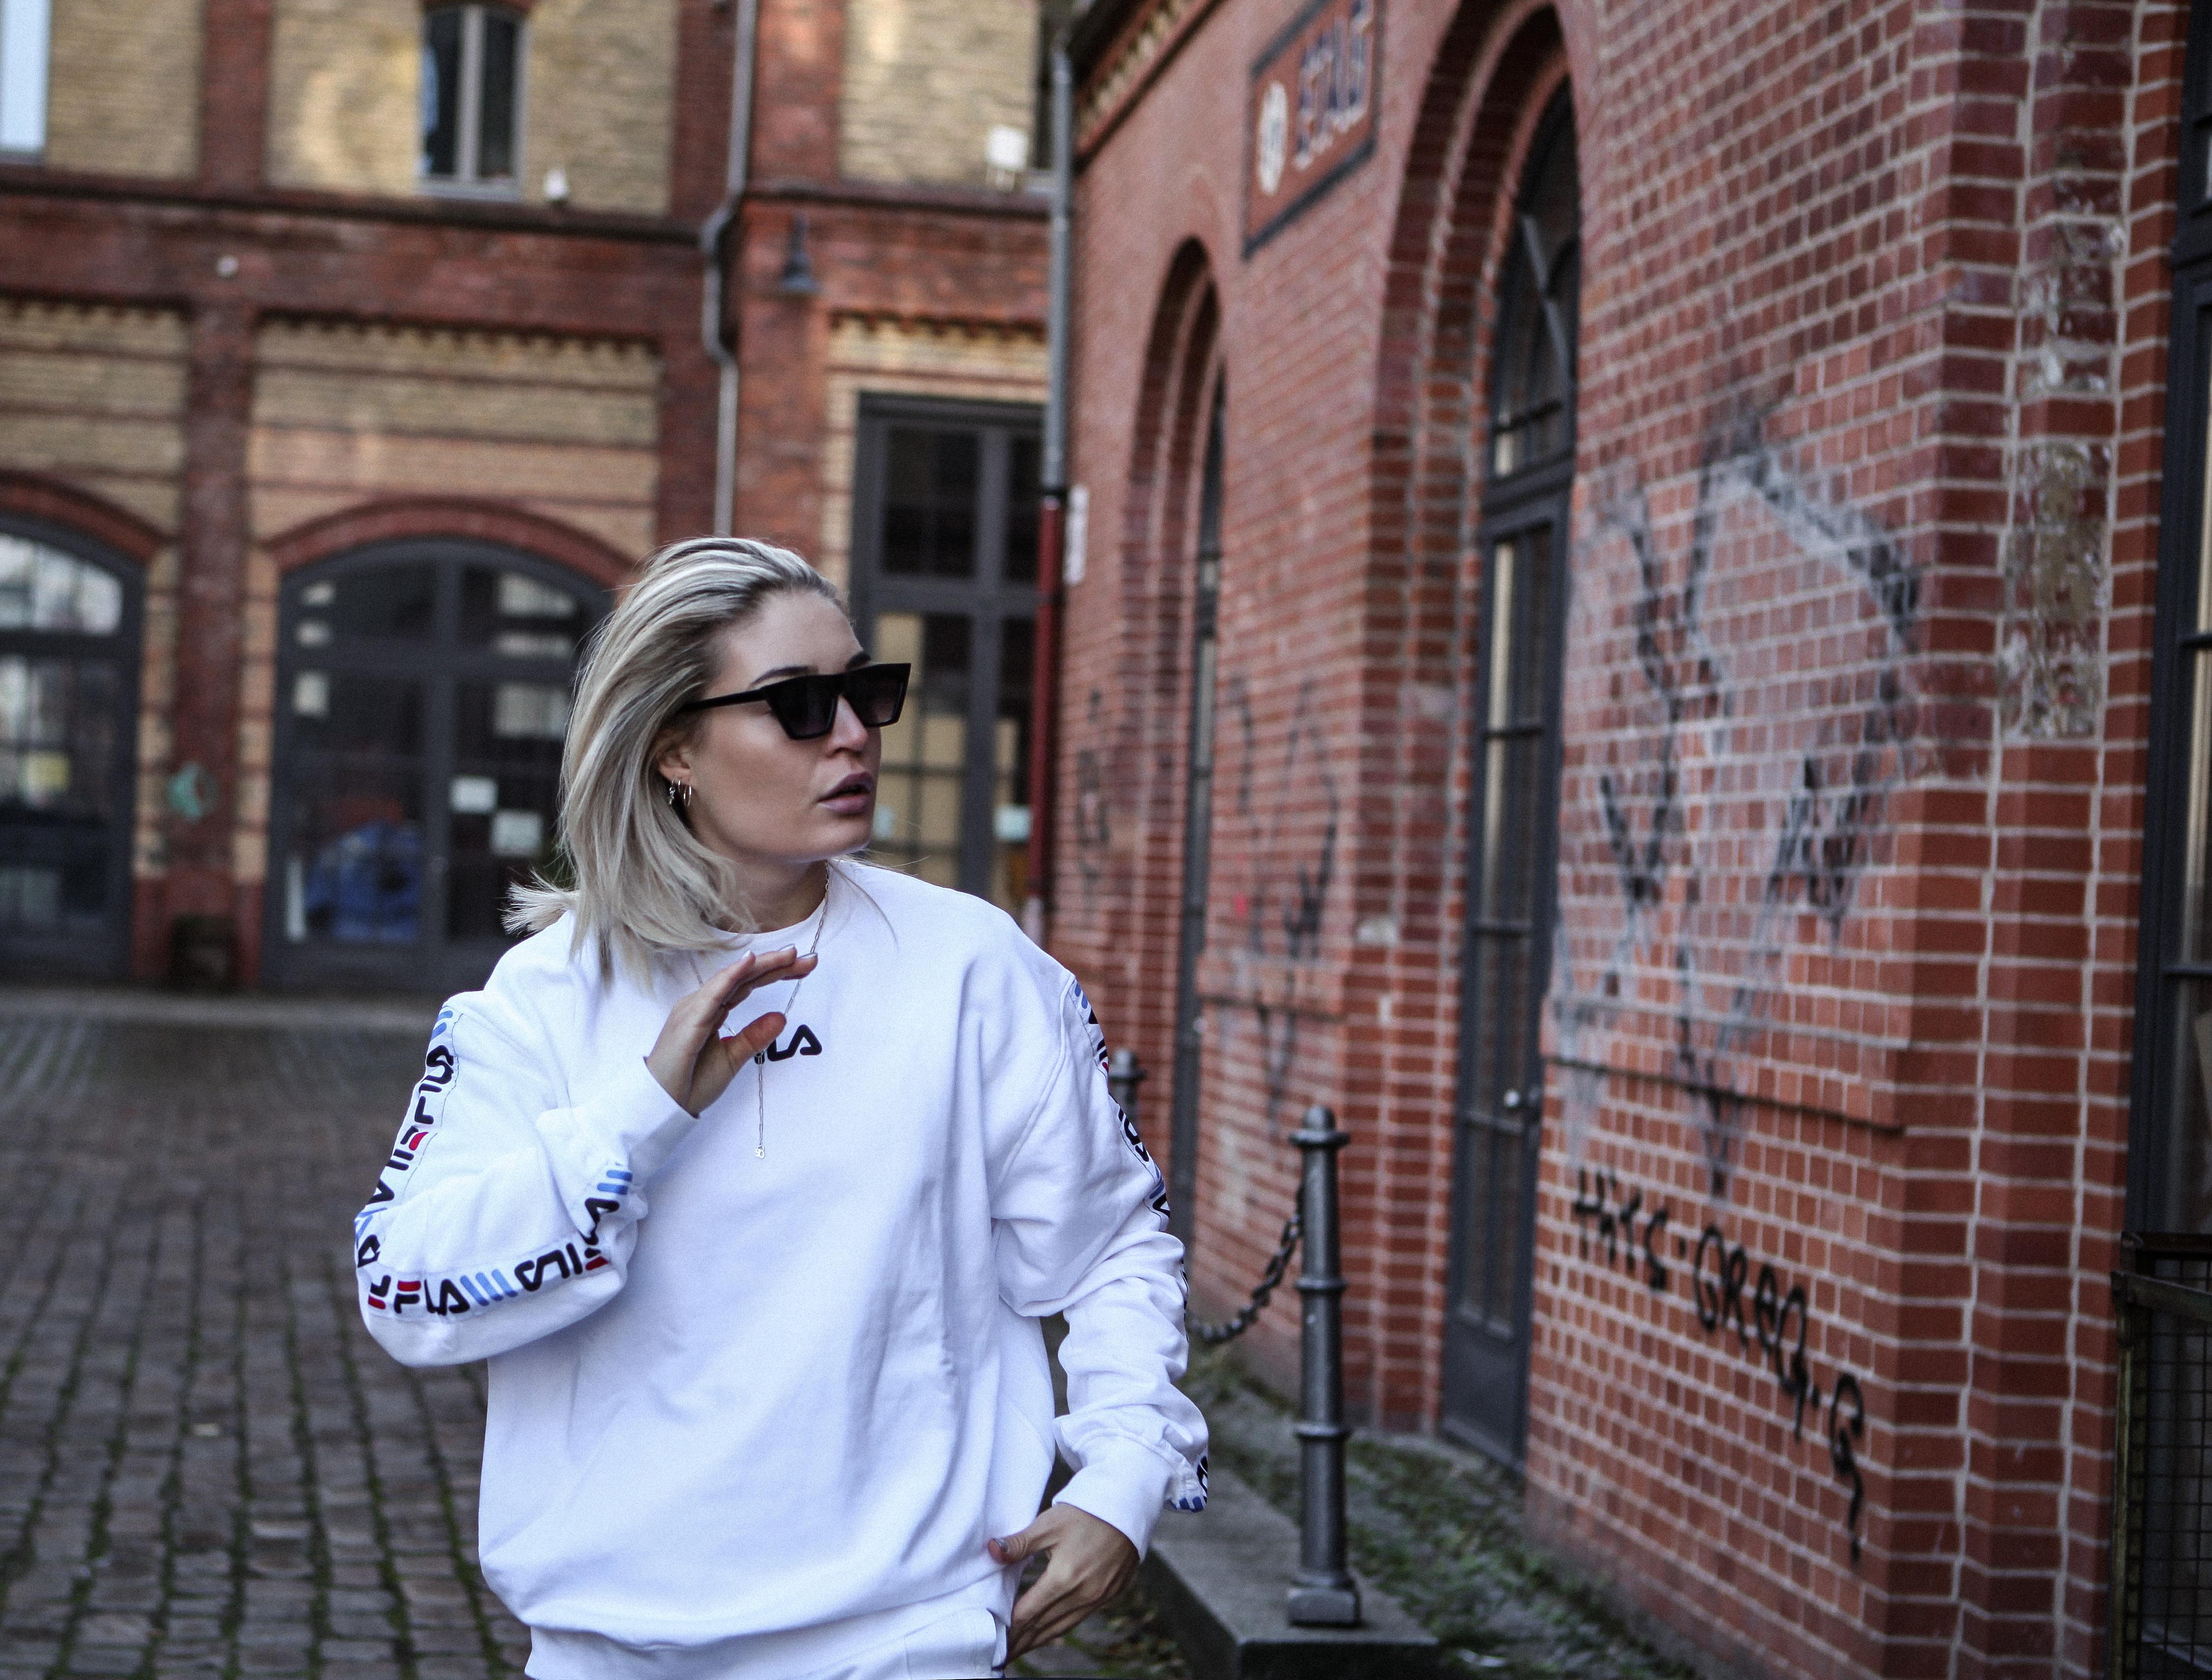 Lauralamode Fila Junkyard Outfit Latex Tracksuit Fashion Blogger Fashionblogger Look Style Streetstyle Berlin Munich